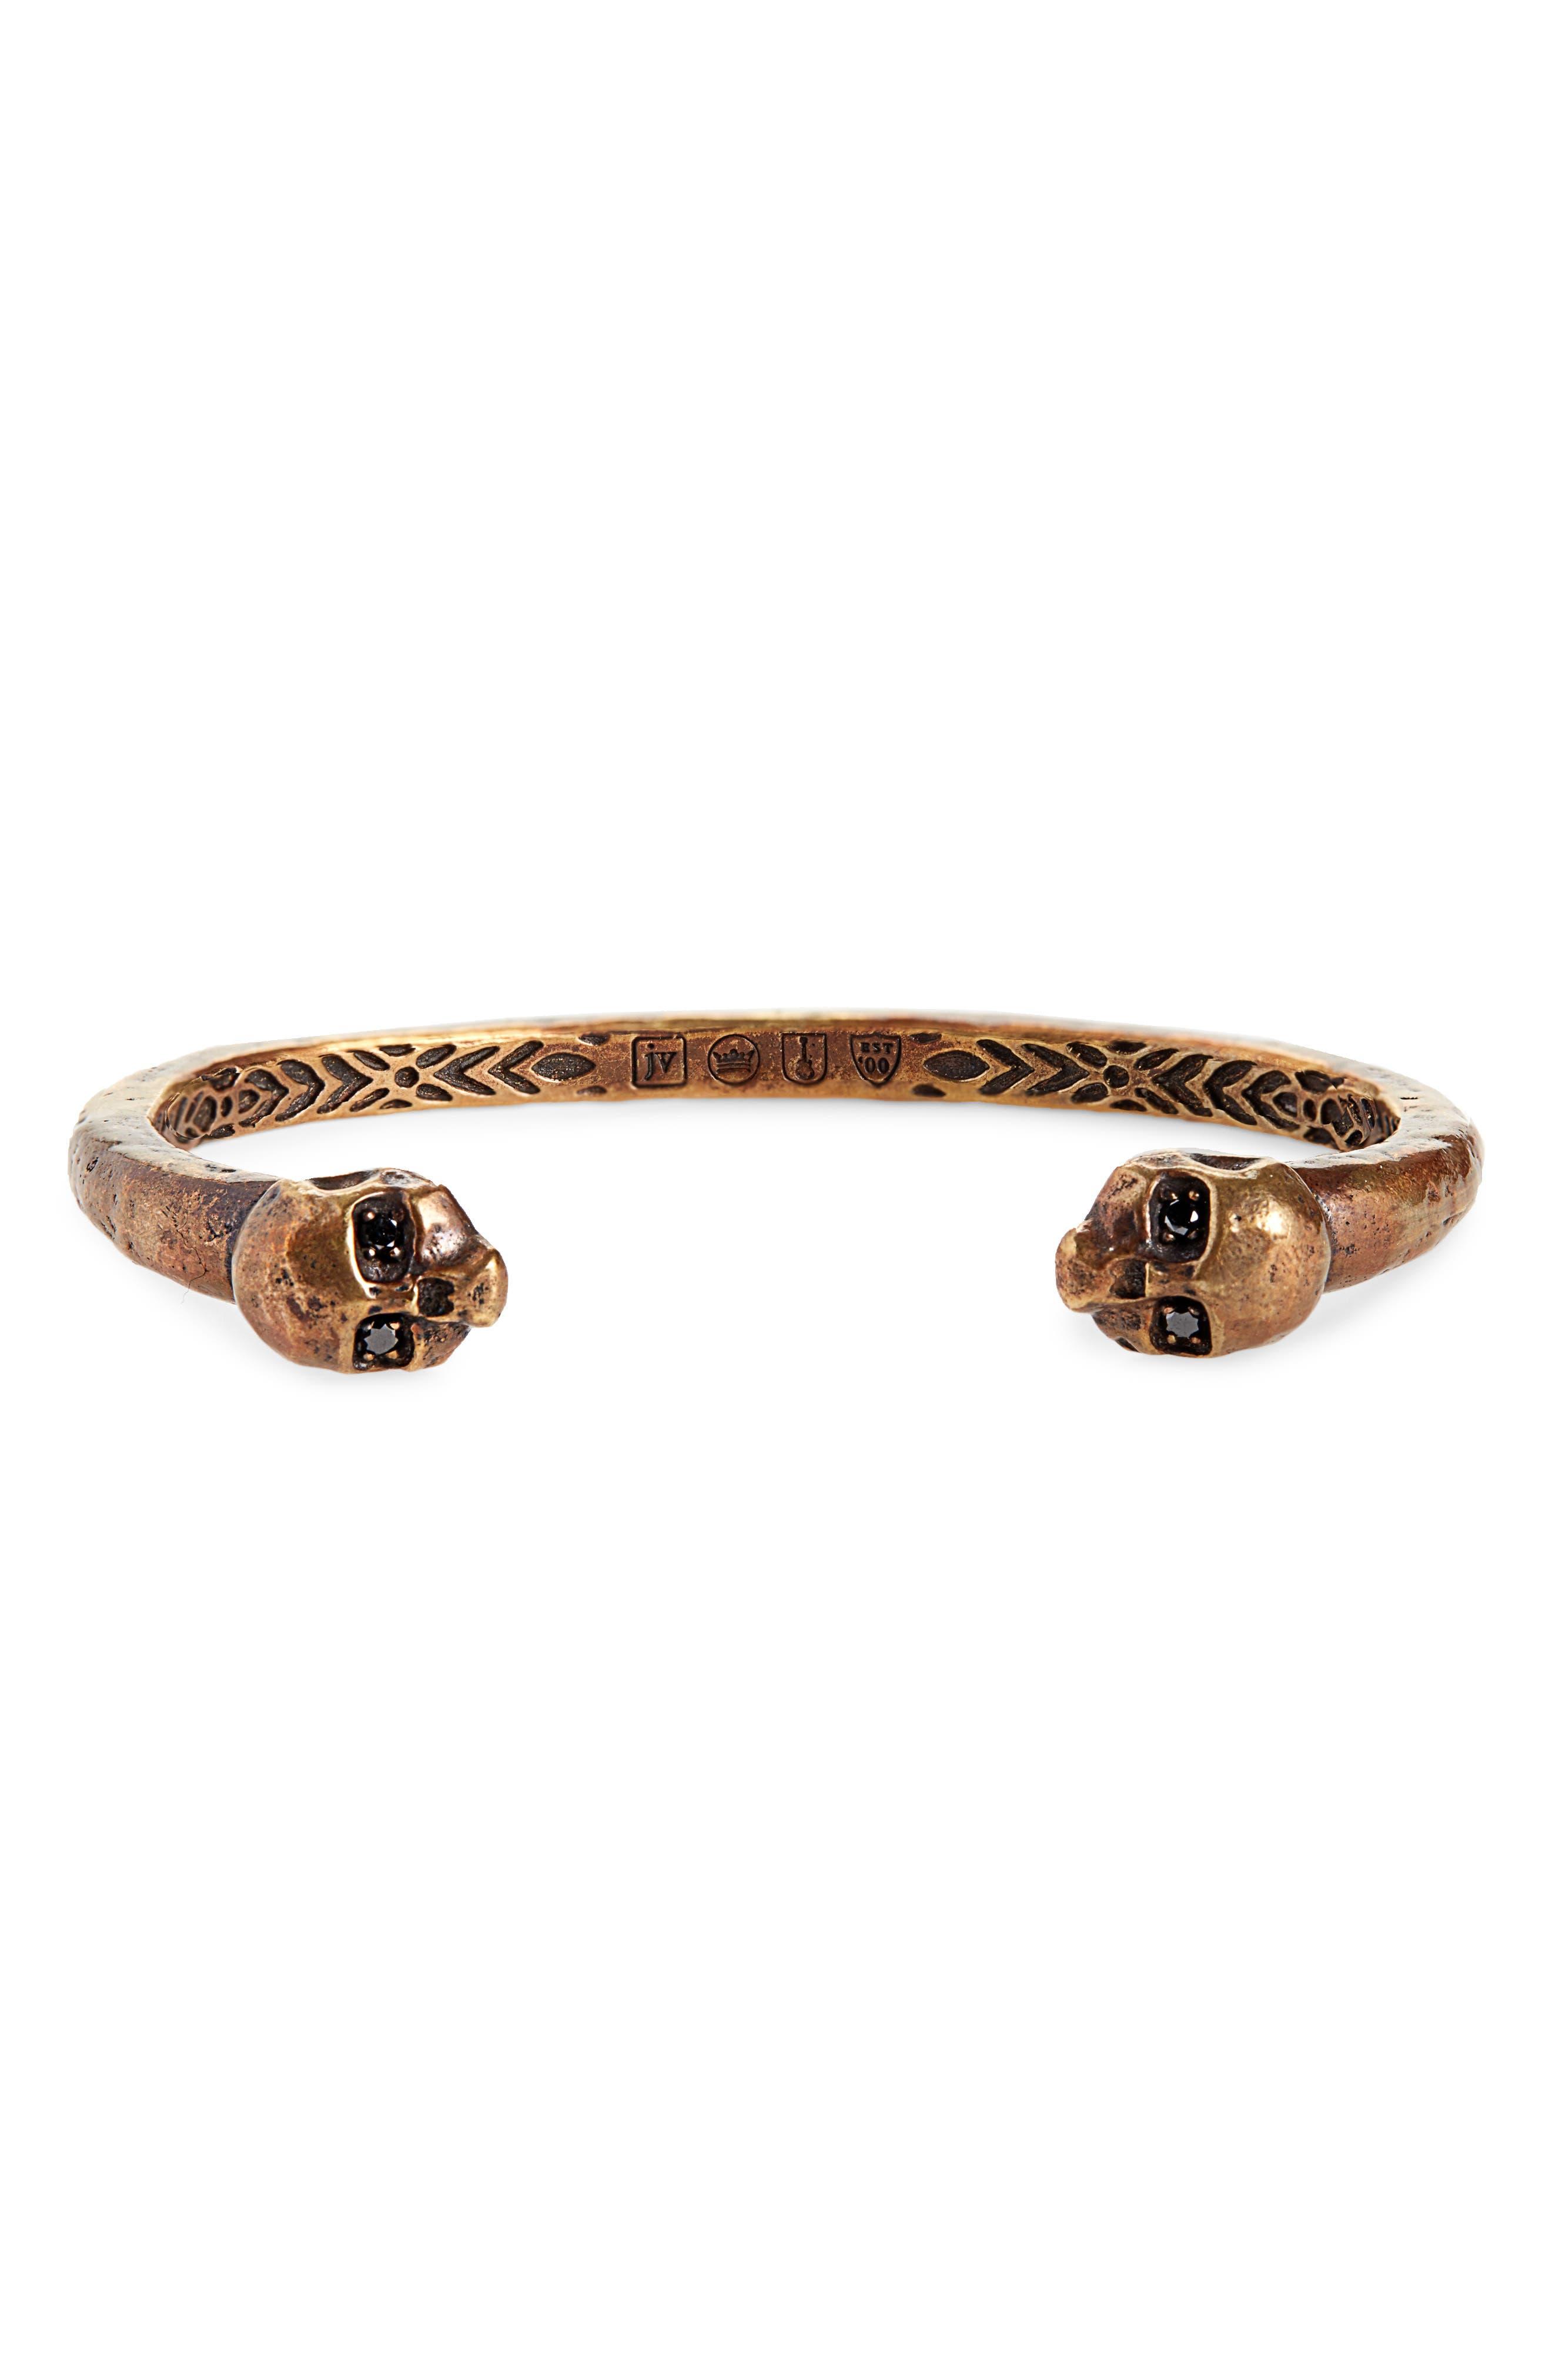 Brass Skull Cuff Bracelet